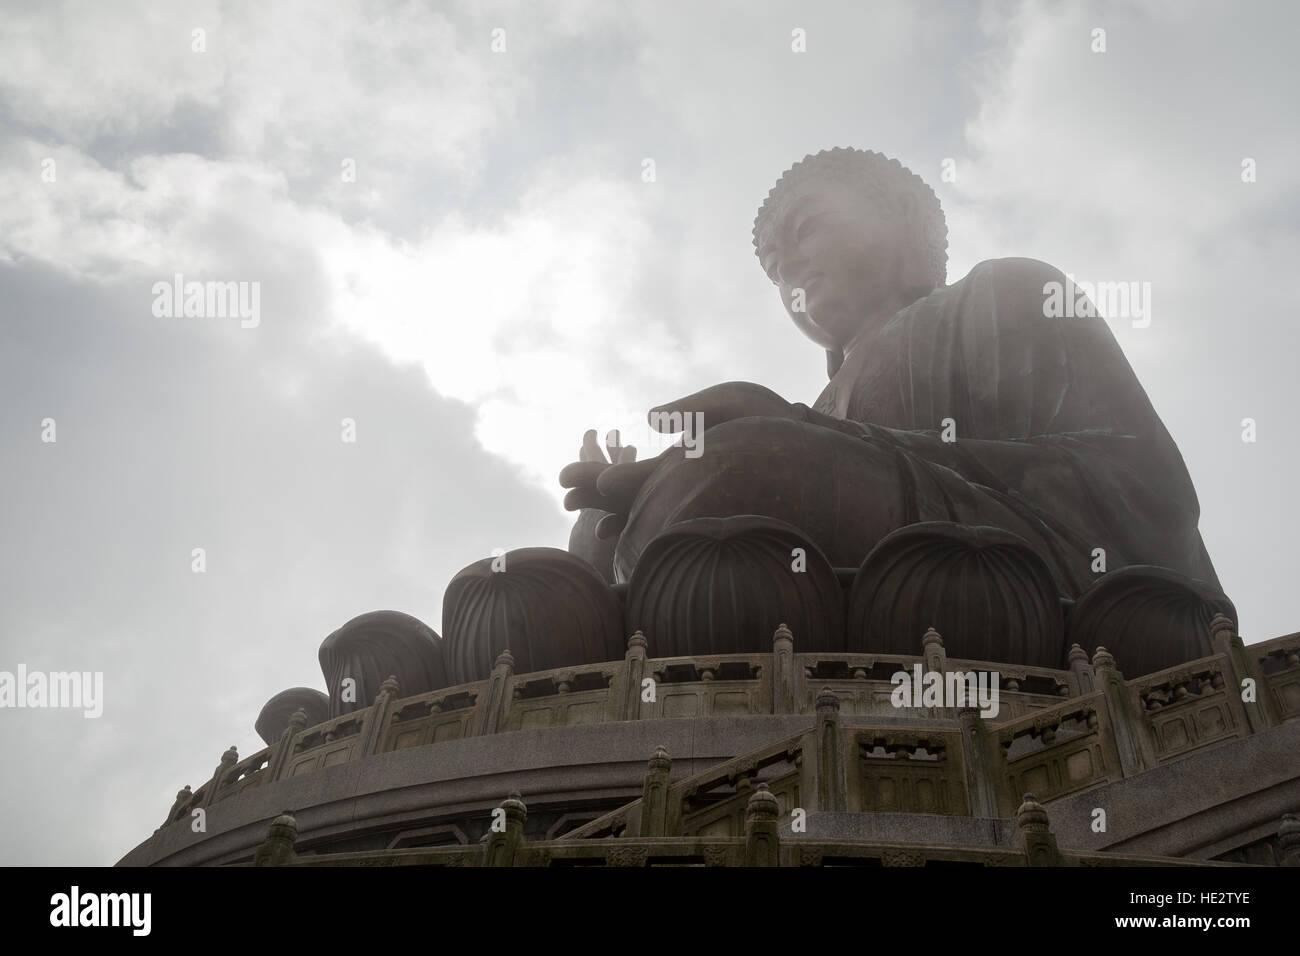 Silhouette of the Tian Tan Buddha (Big Buddha) statue on Lantau Island in Hong Kong, China. - Stock Image